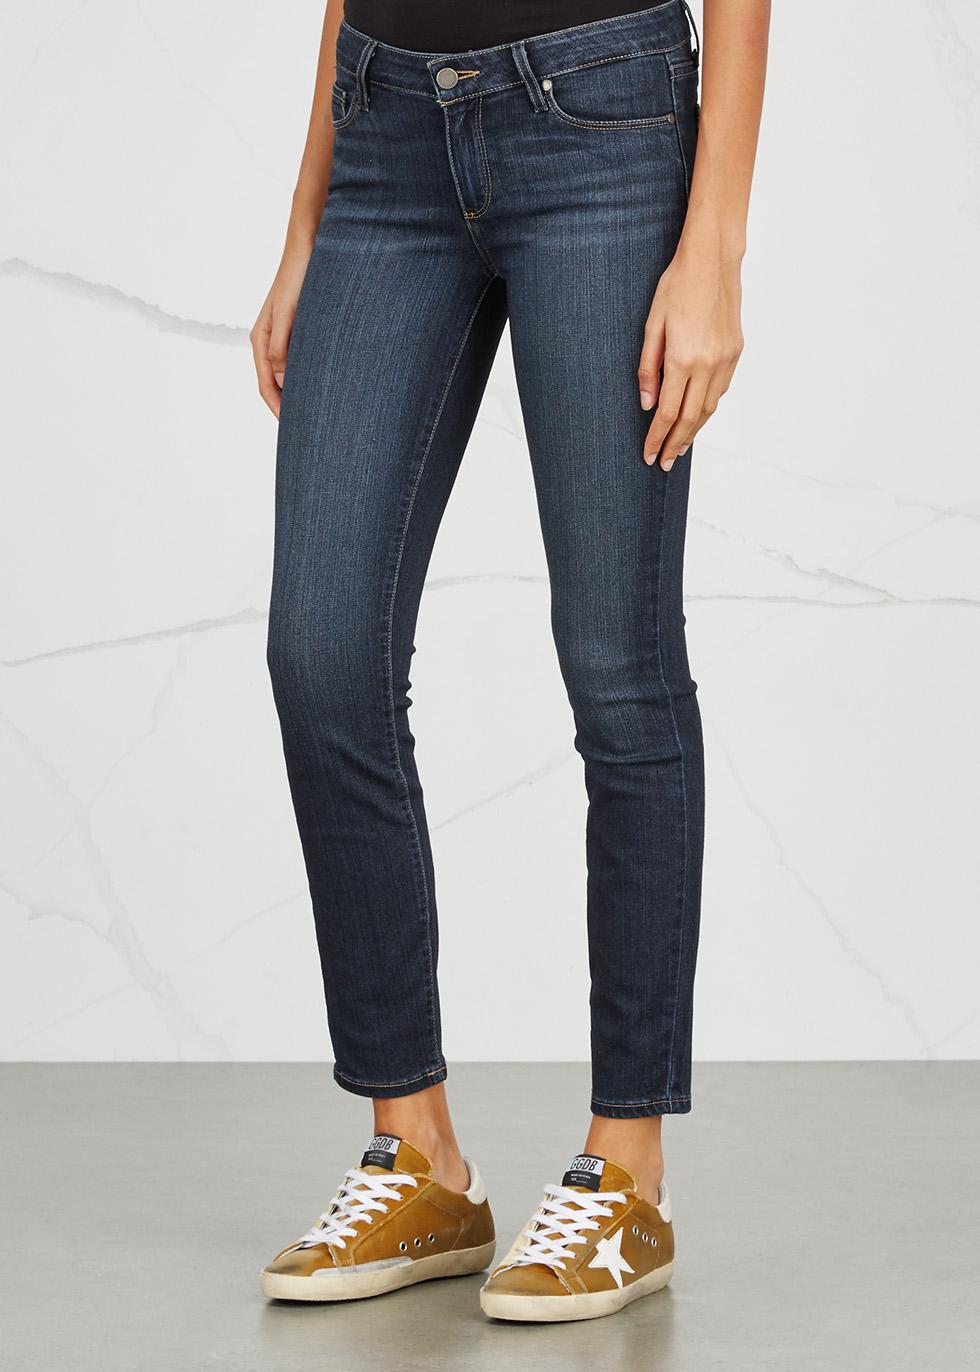 Verdugo Transcend dark blue skinny jeans - Paige